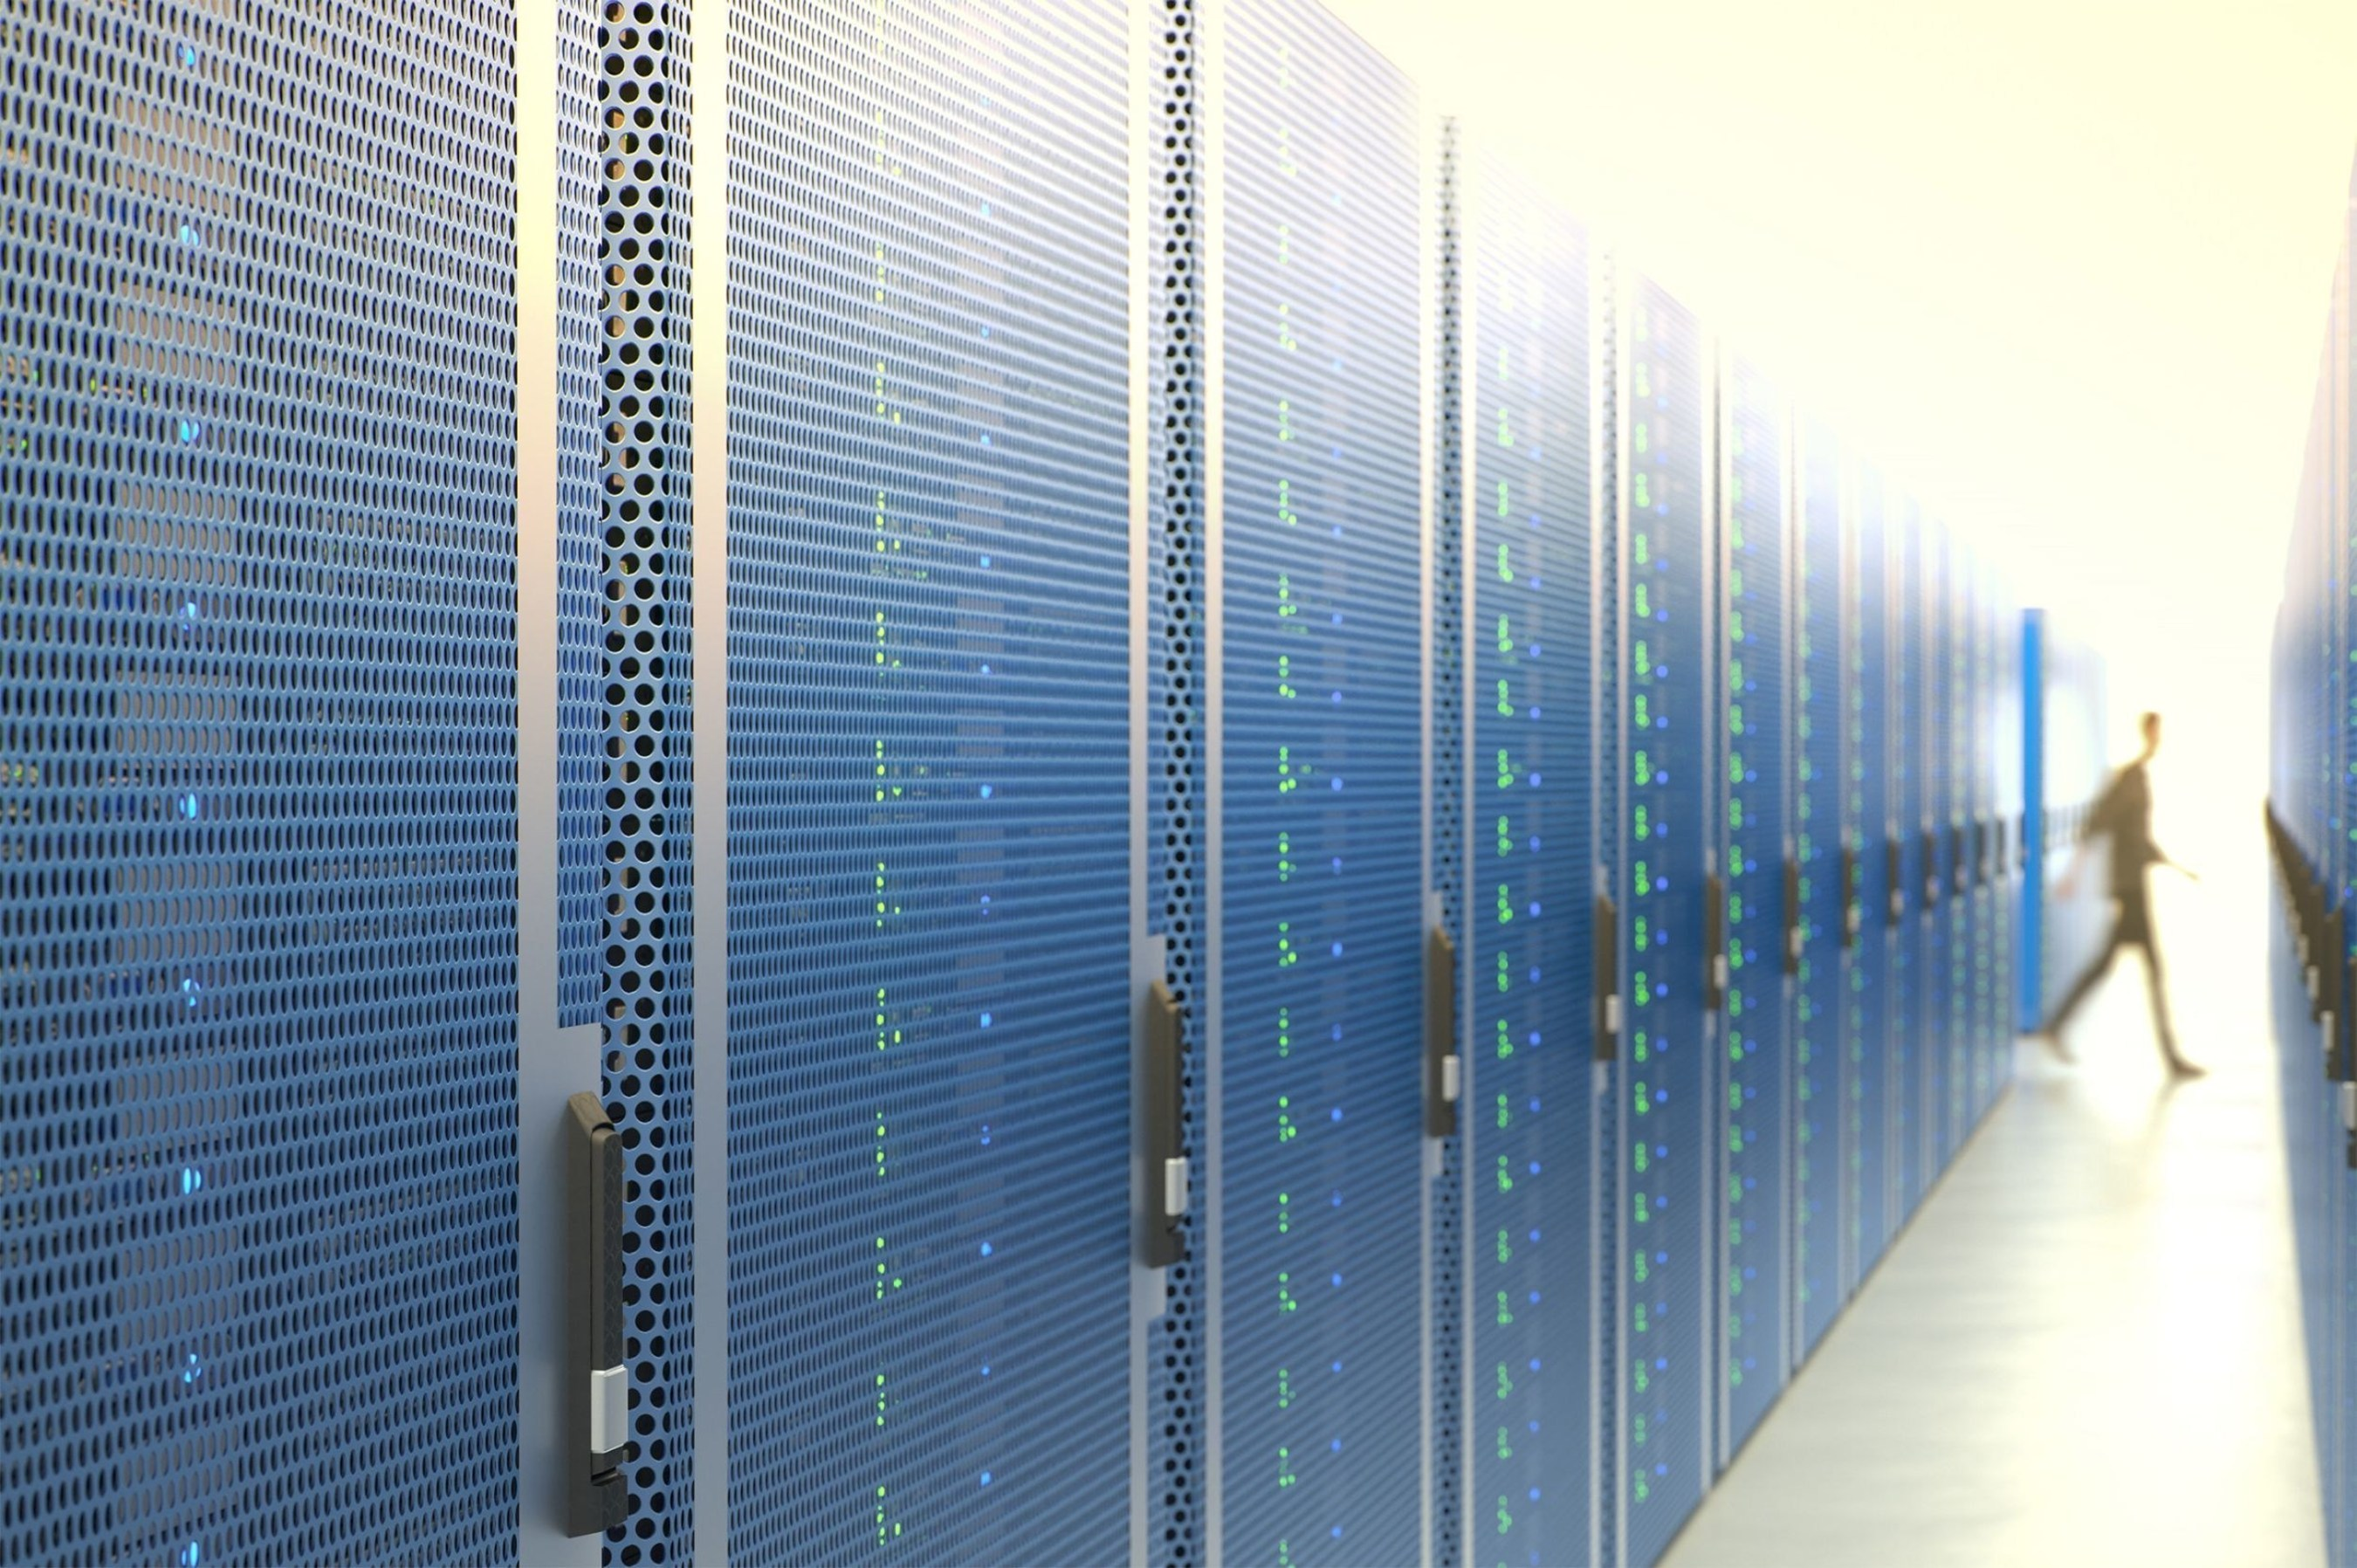 Data center cooling (PRNewsFoto/Alfa Laval Lund) (PRNewsFoto/Alfa Laval Lund)